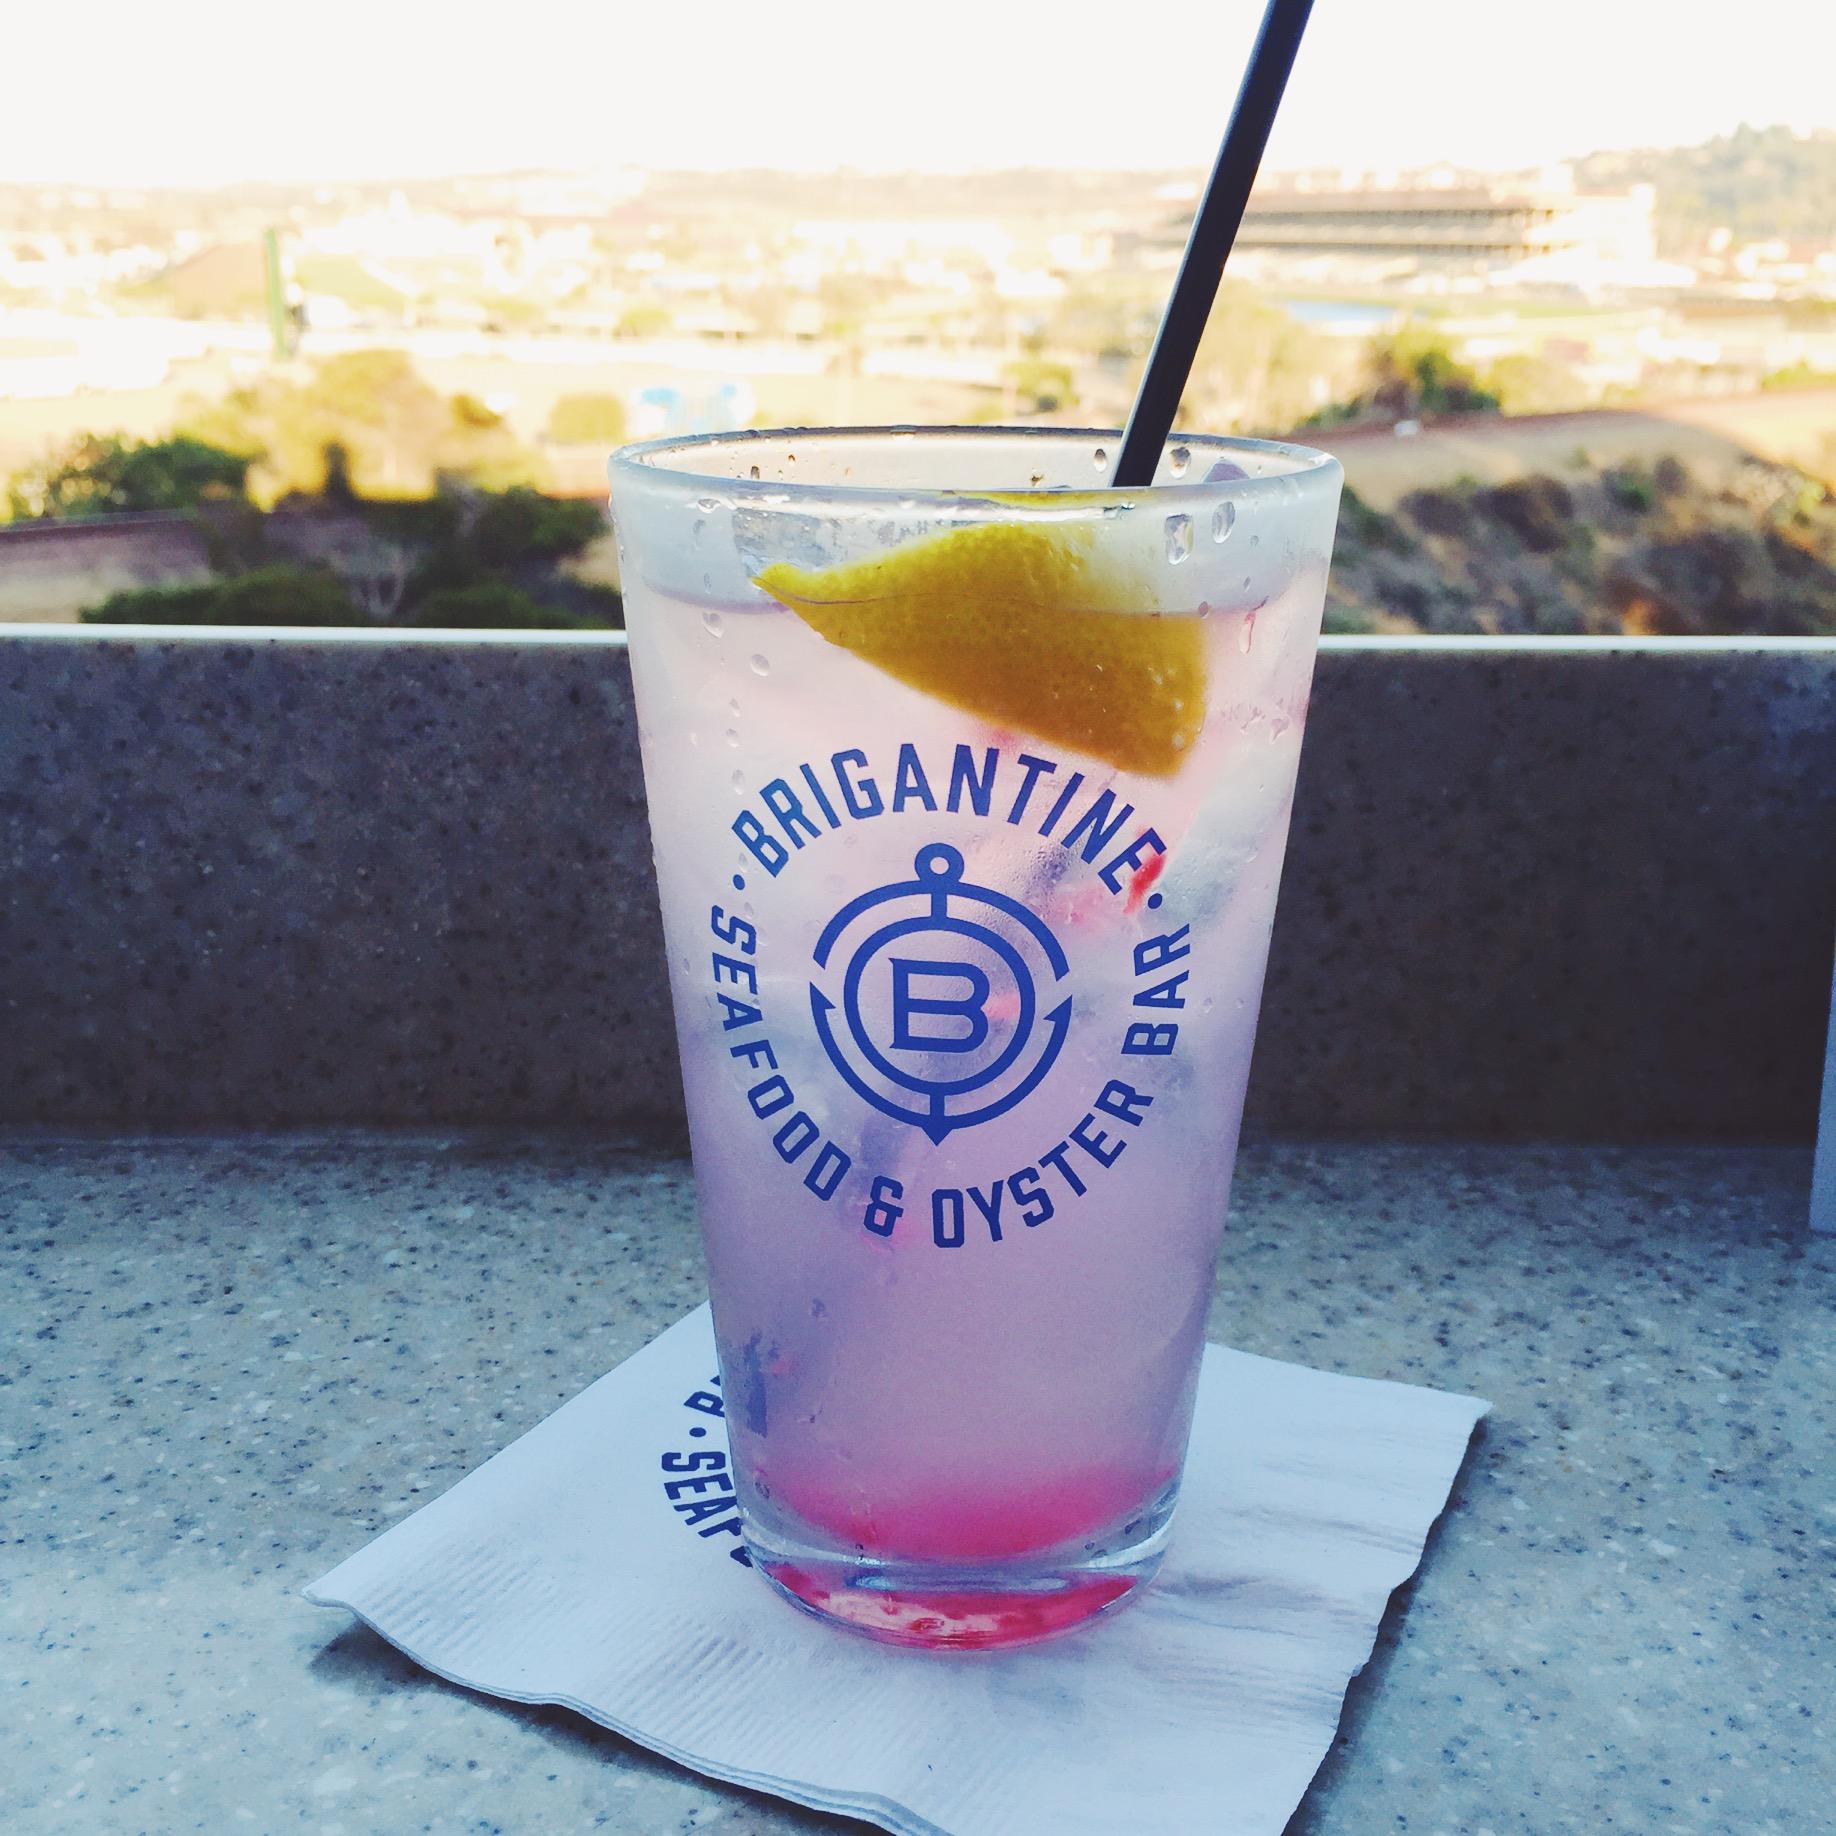 Drinks at the Brigantine overlooking Del Mar racetrack.